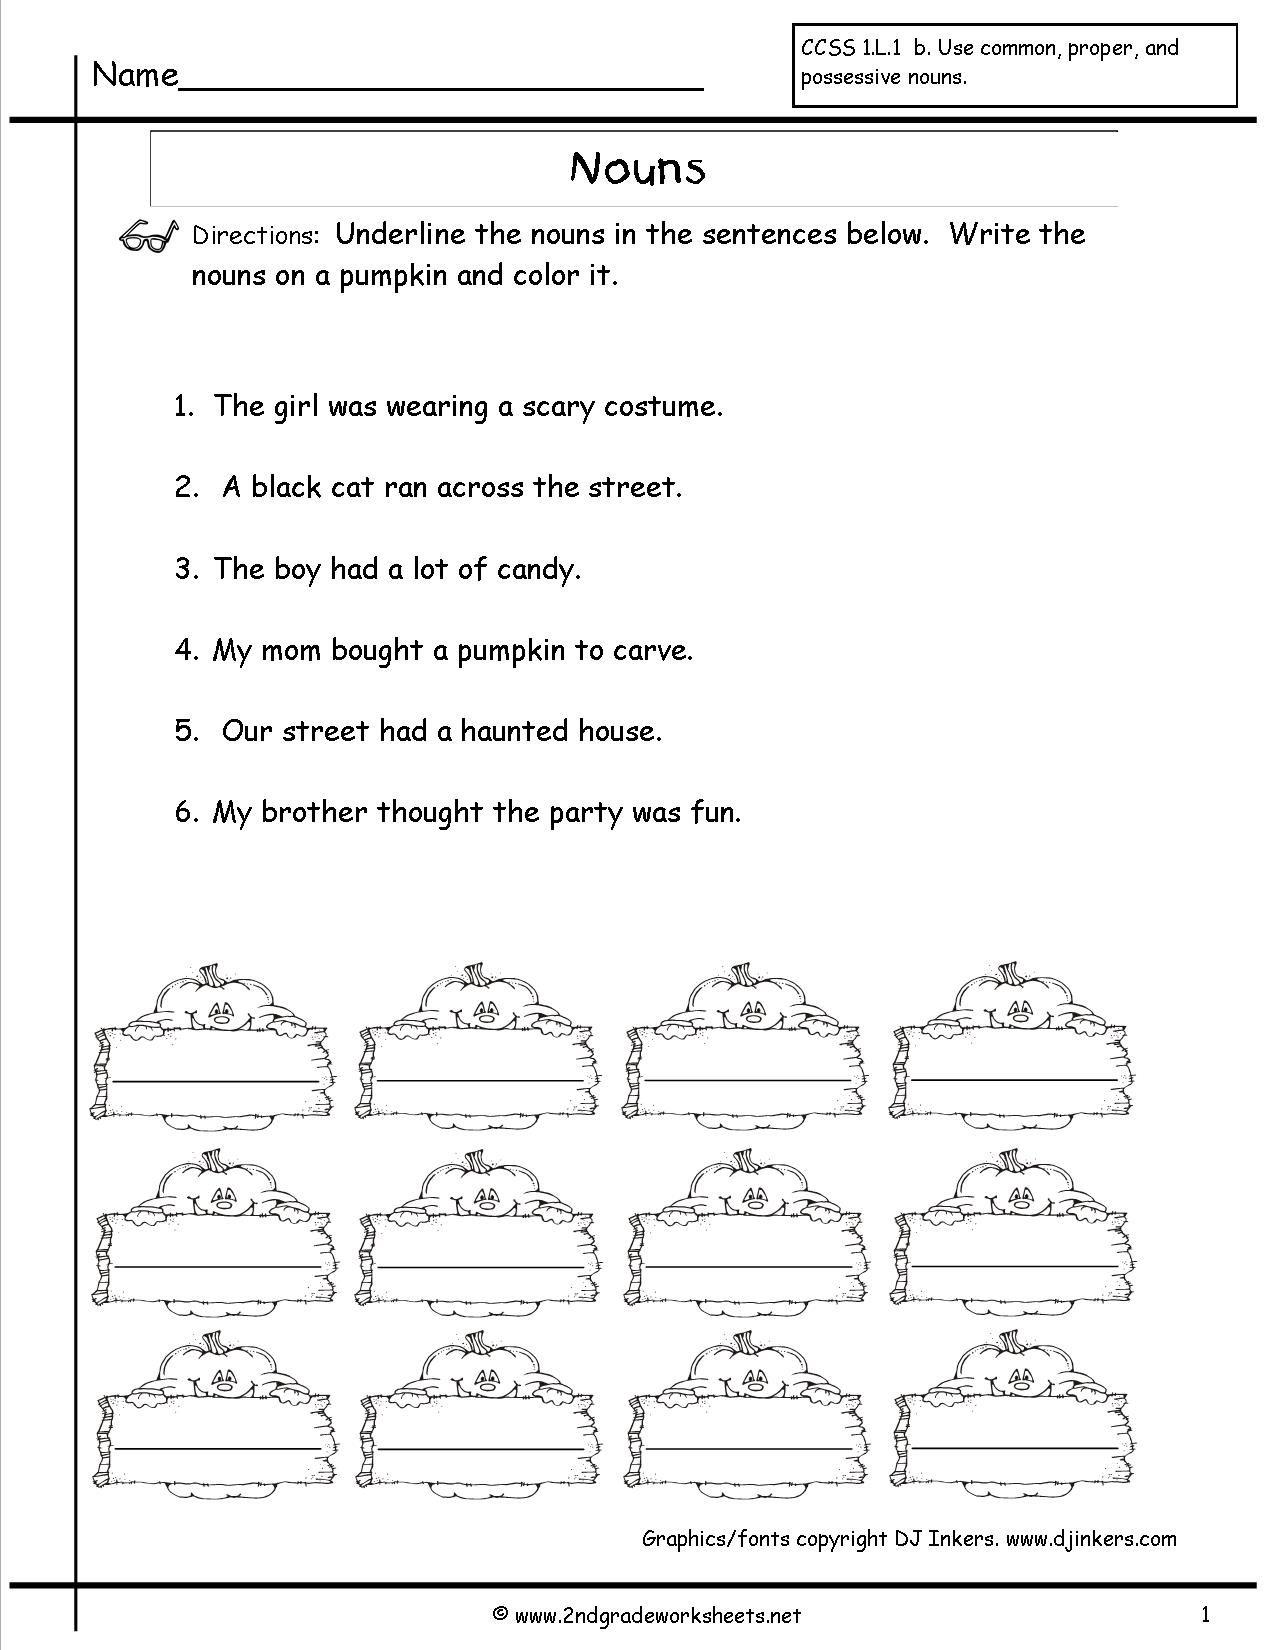 English Grammar Noun Worksheet For Grade 1 Awesome Nouns